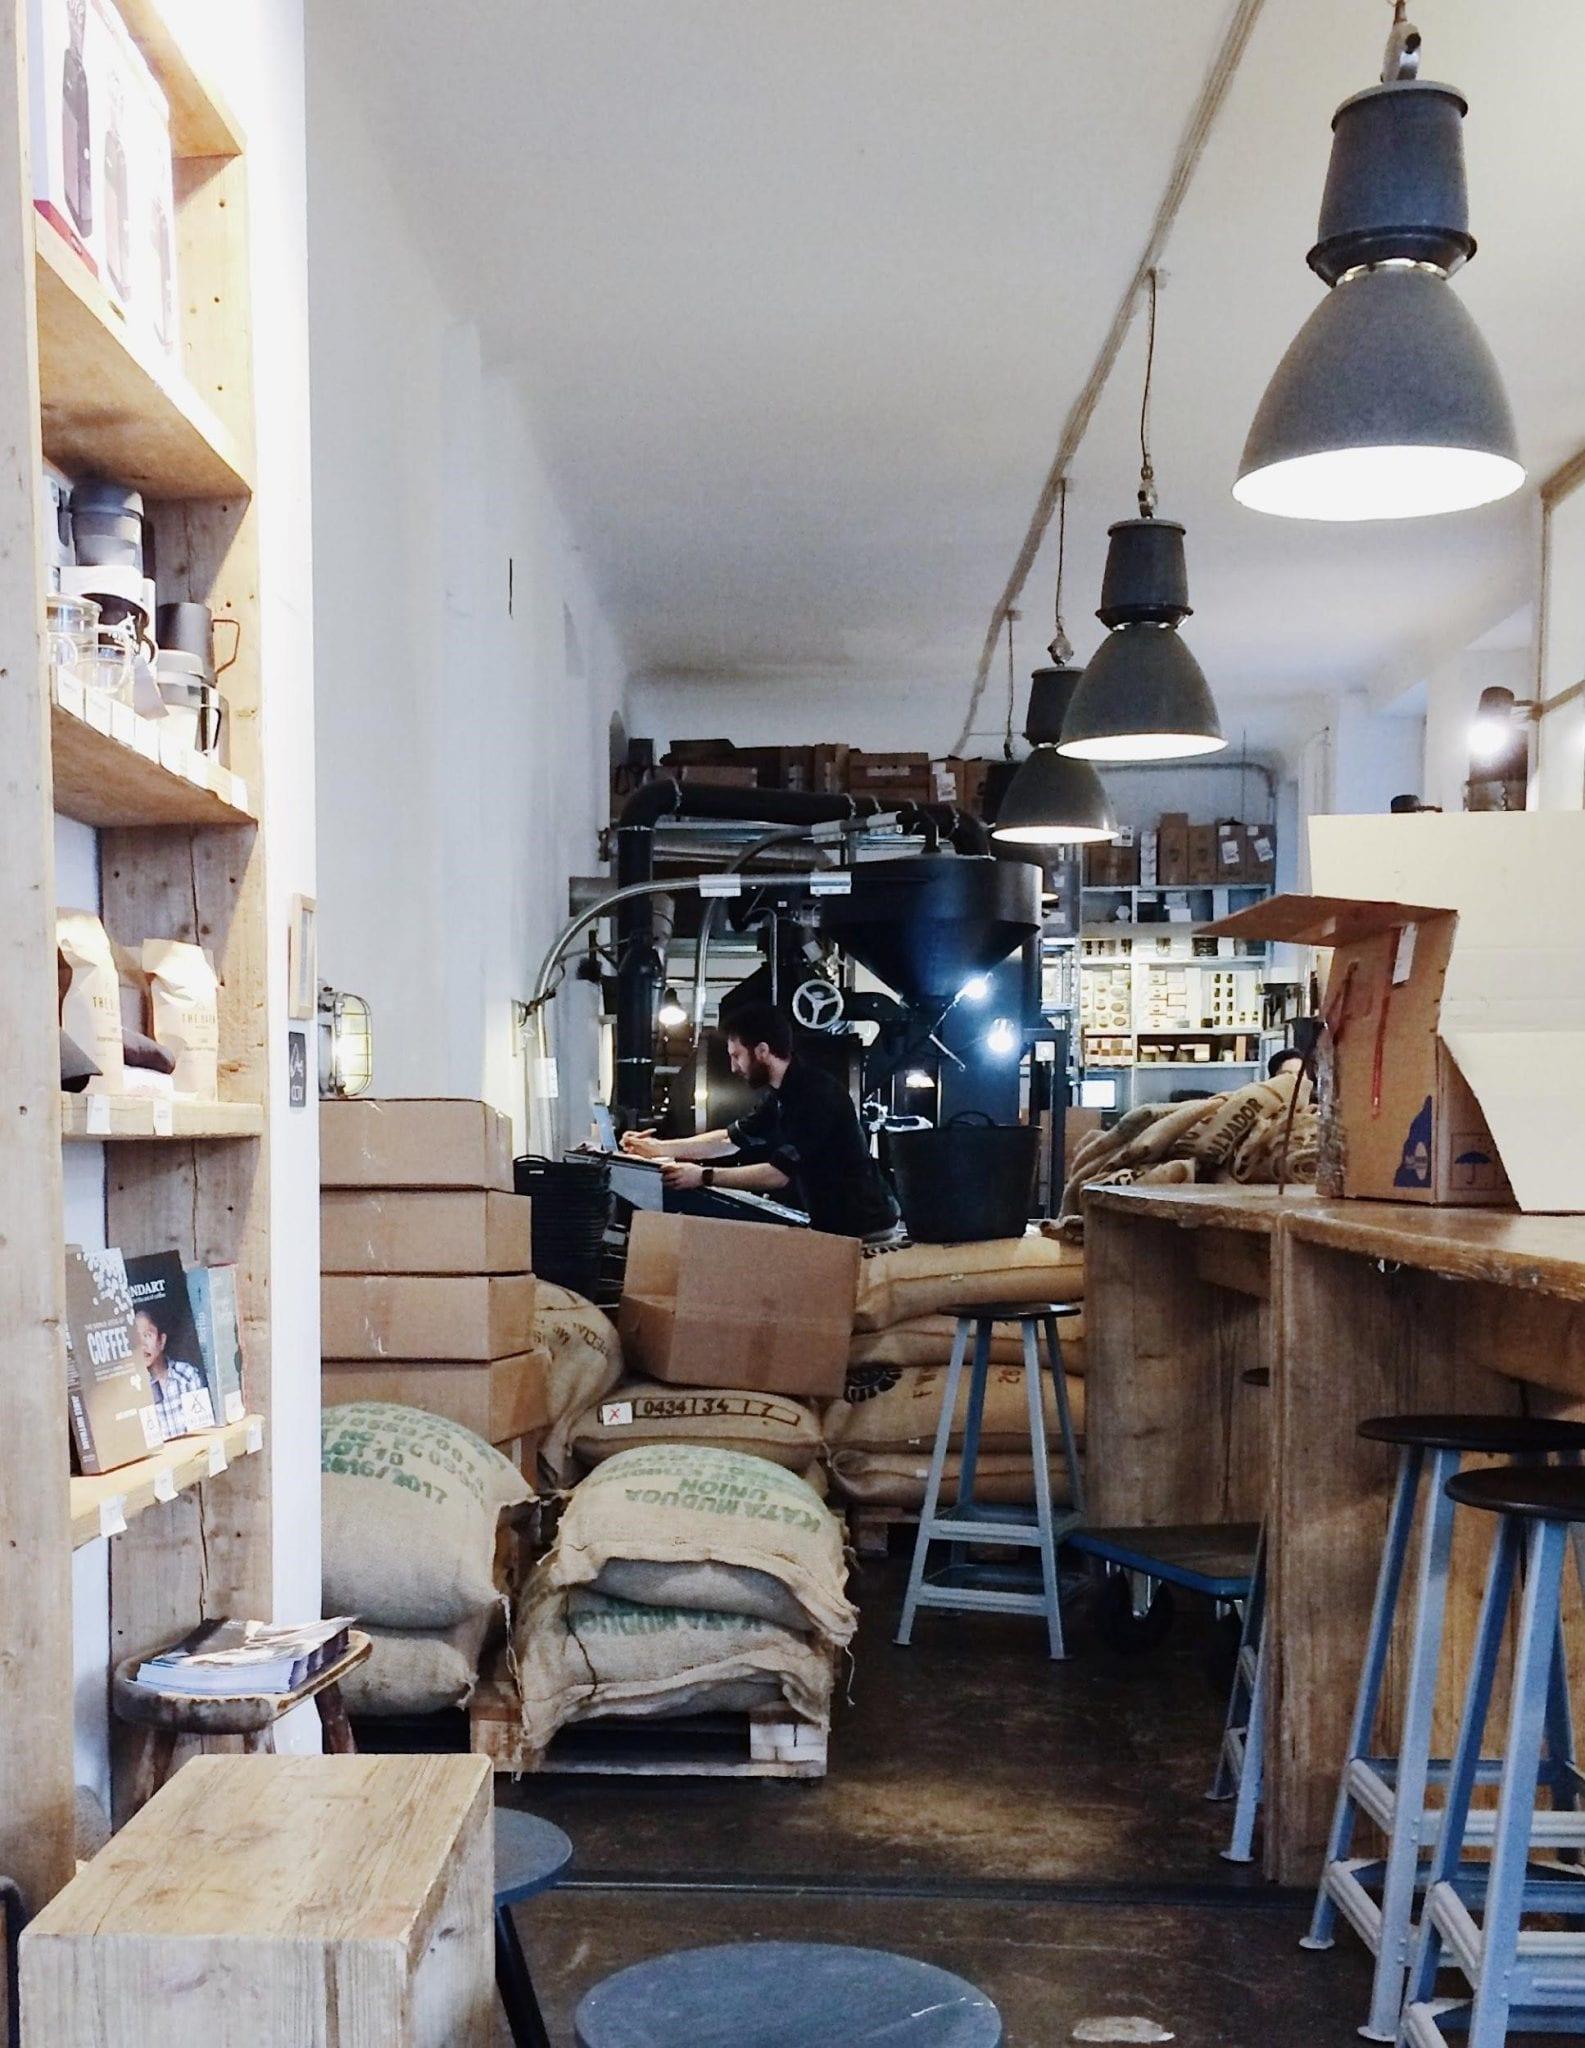 a roastery into a coffee shop